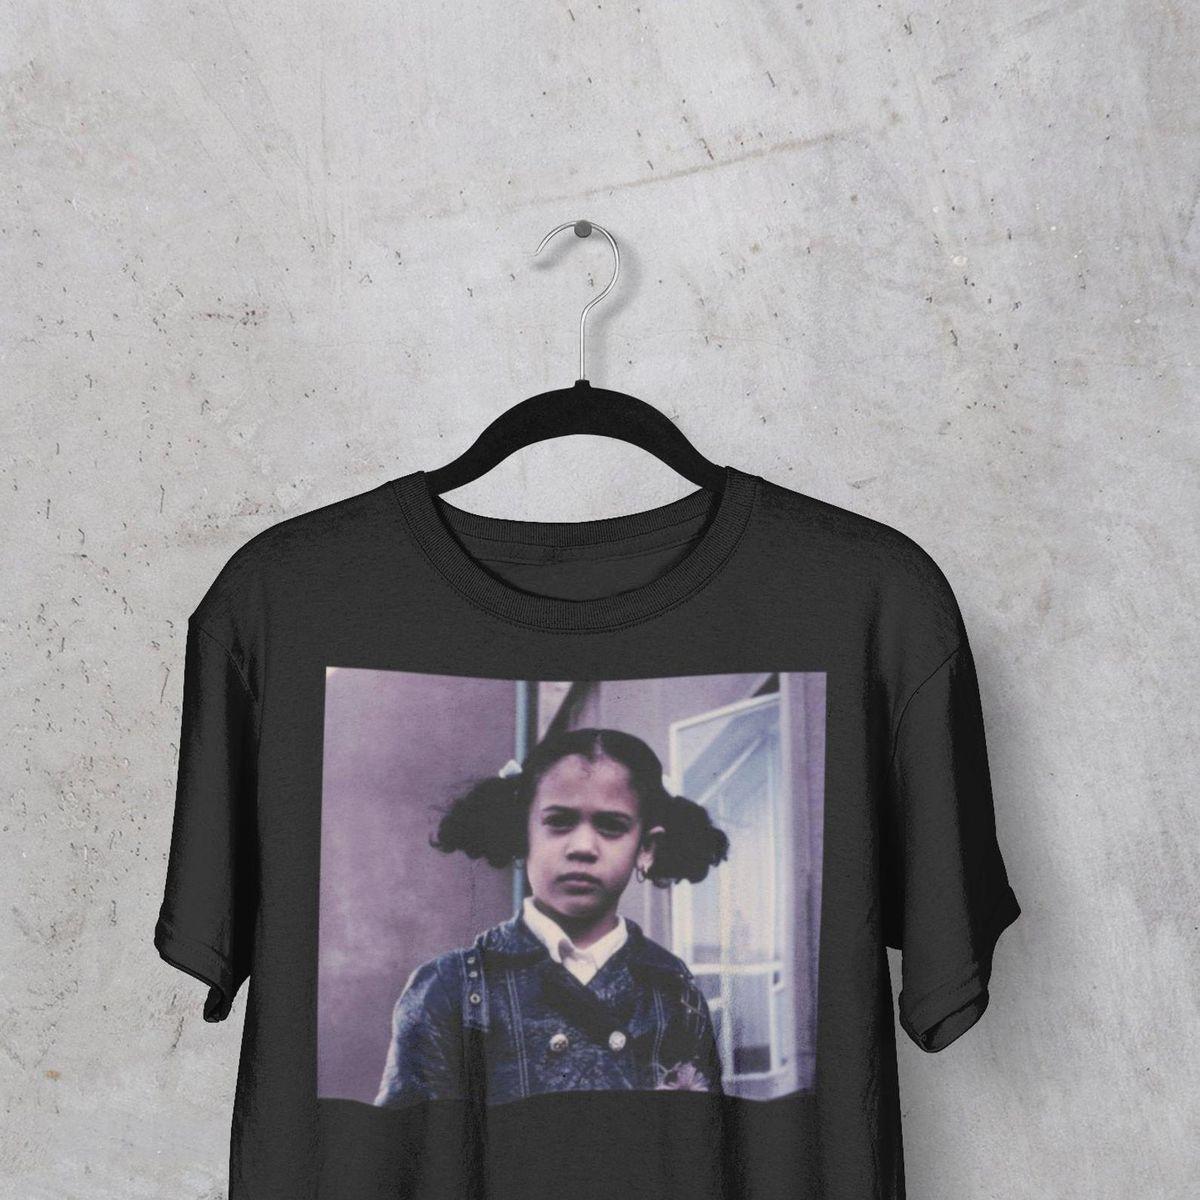 Kamala Harris Original /'Unite/' Art Denim Jacket One of a kind resist in style vice presidential nominee 2020 election gear biden harris